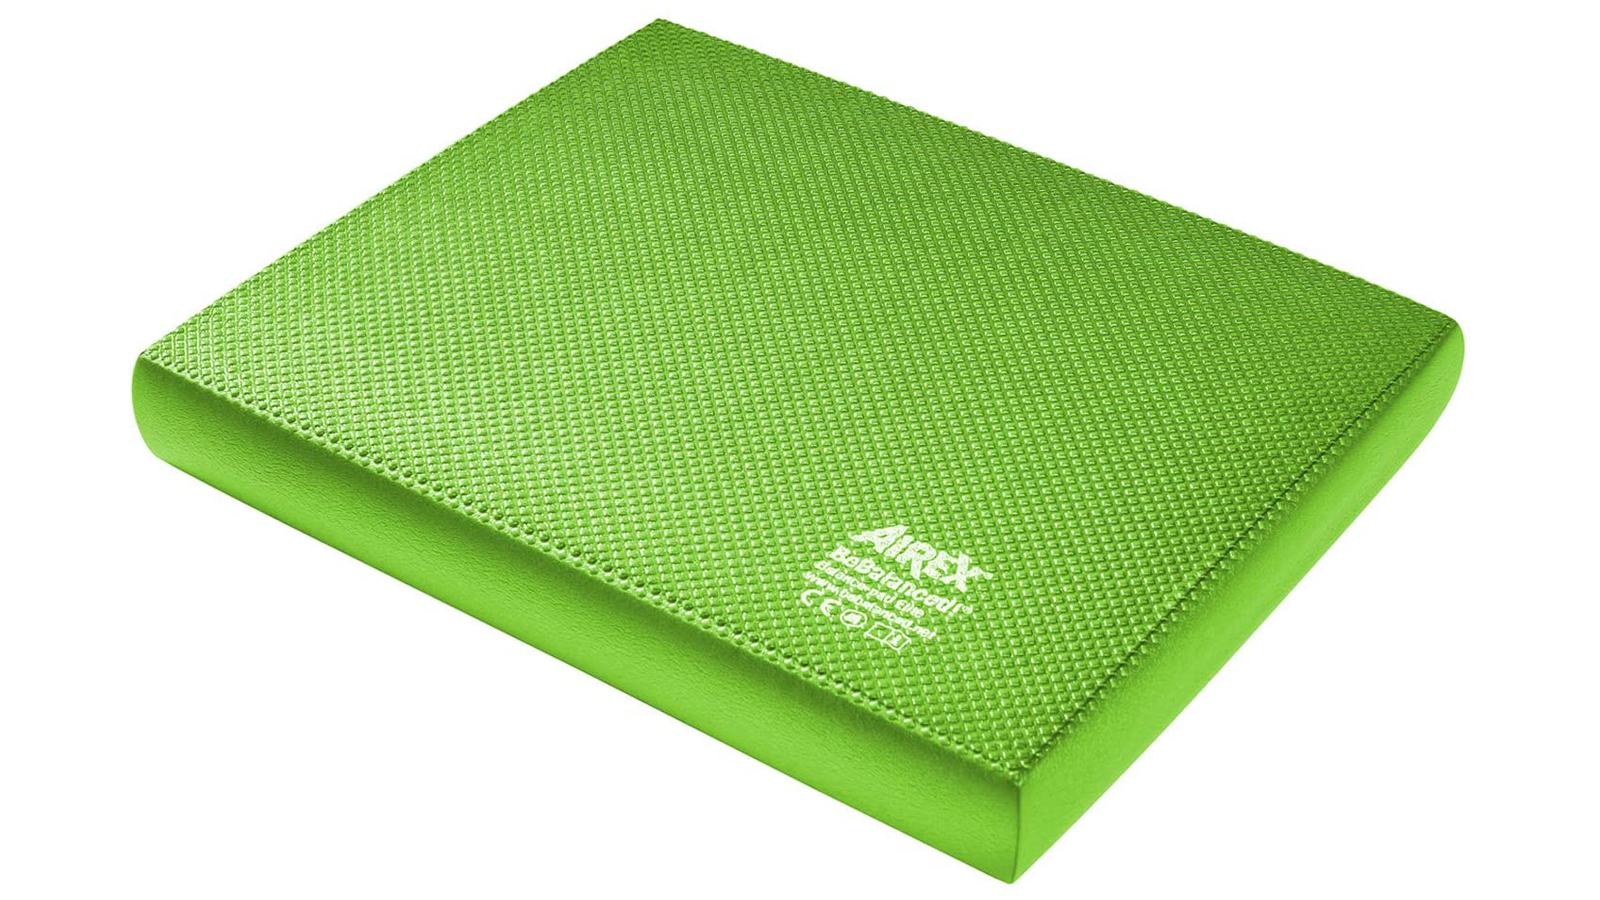 Airex balance pad exercise foam pad